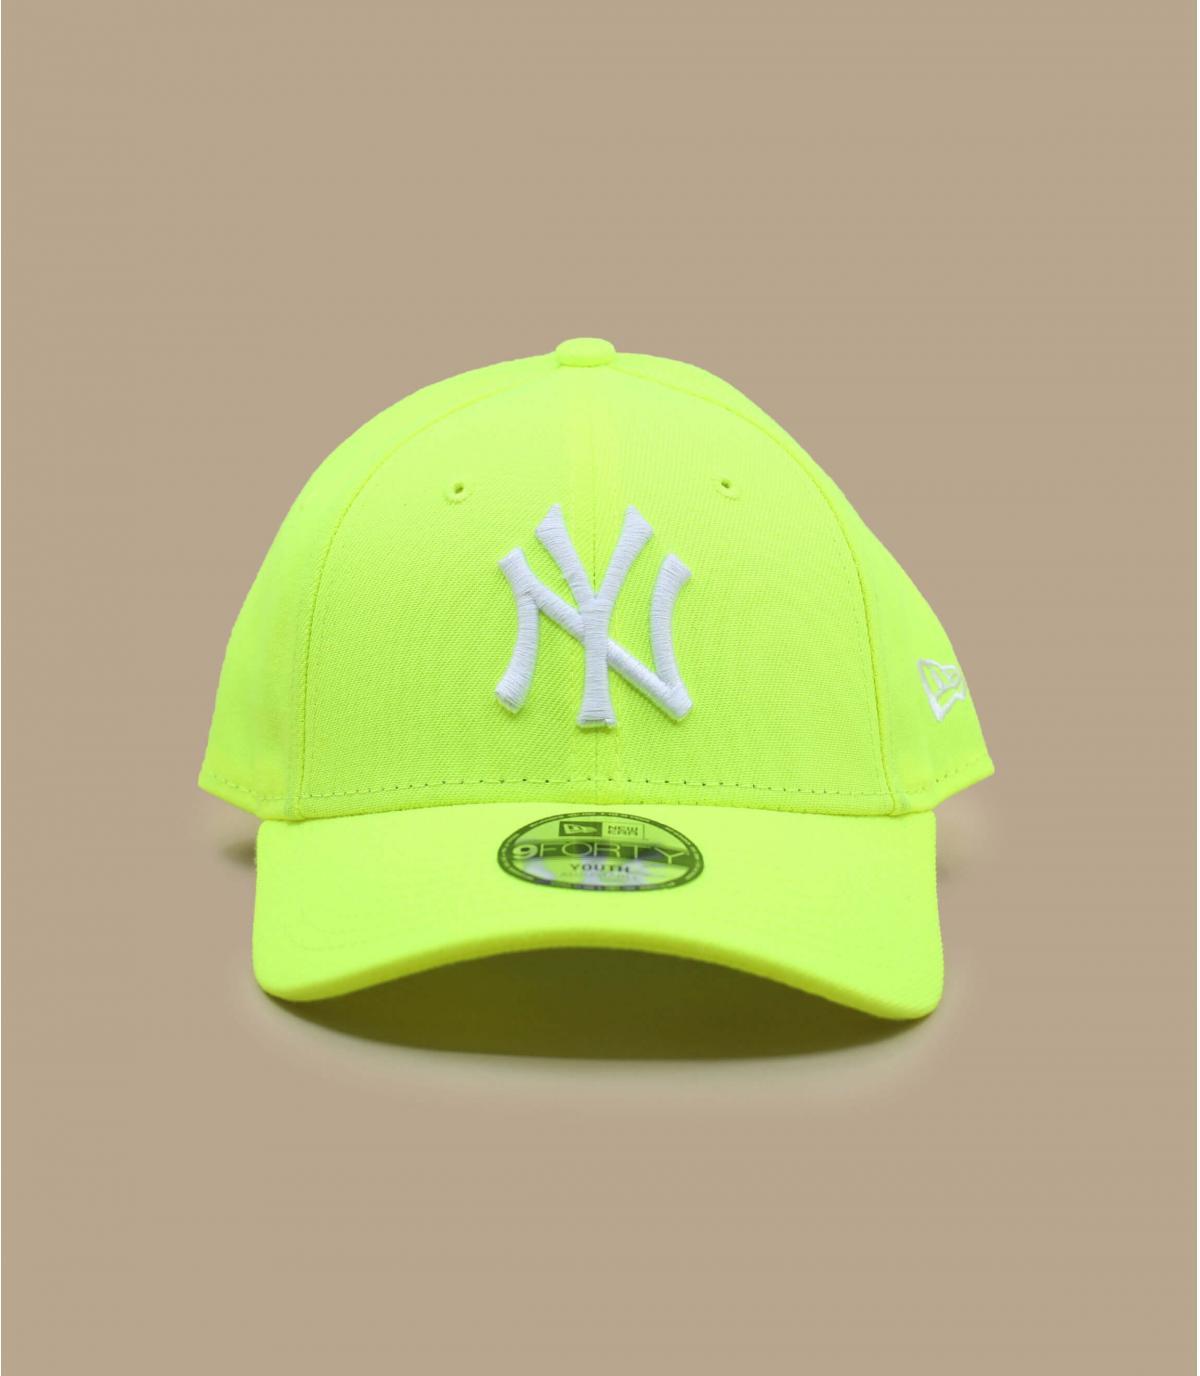 casquette enfant NY jaune fluo